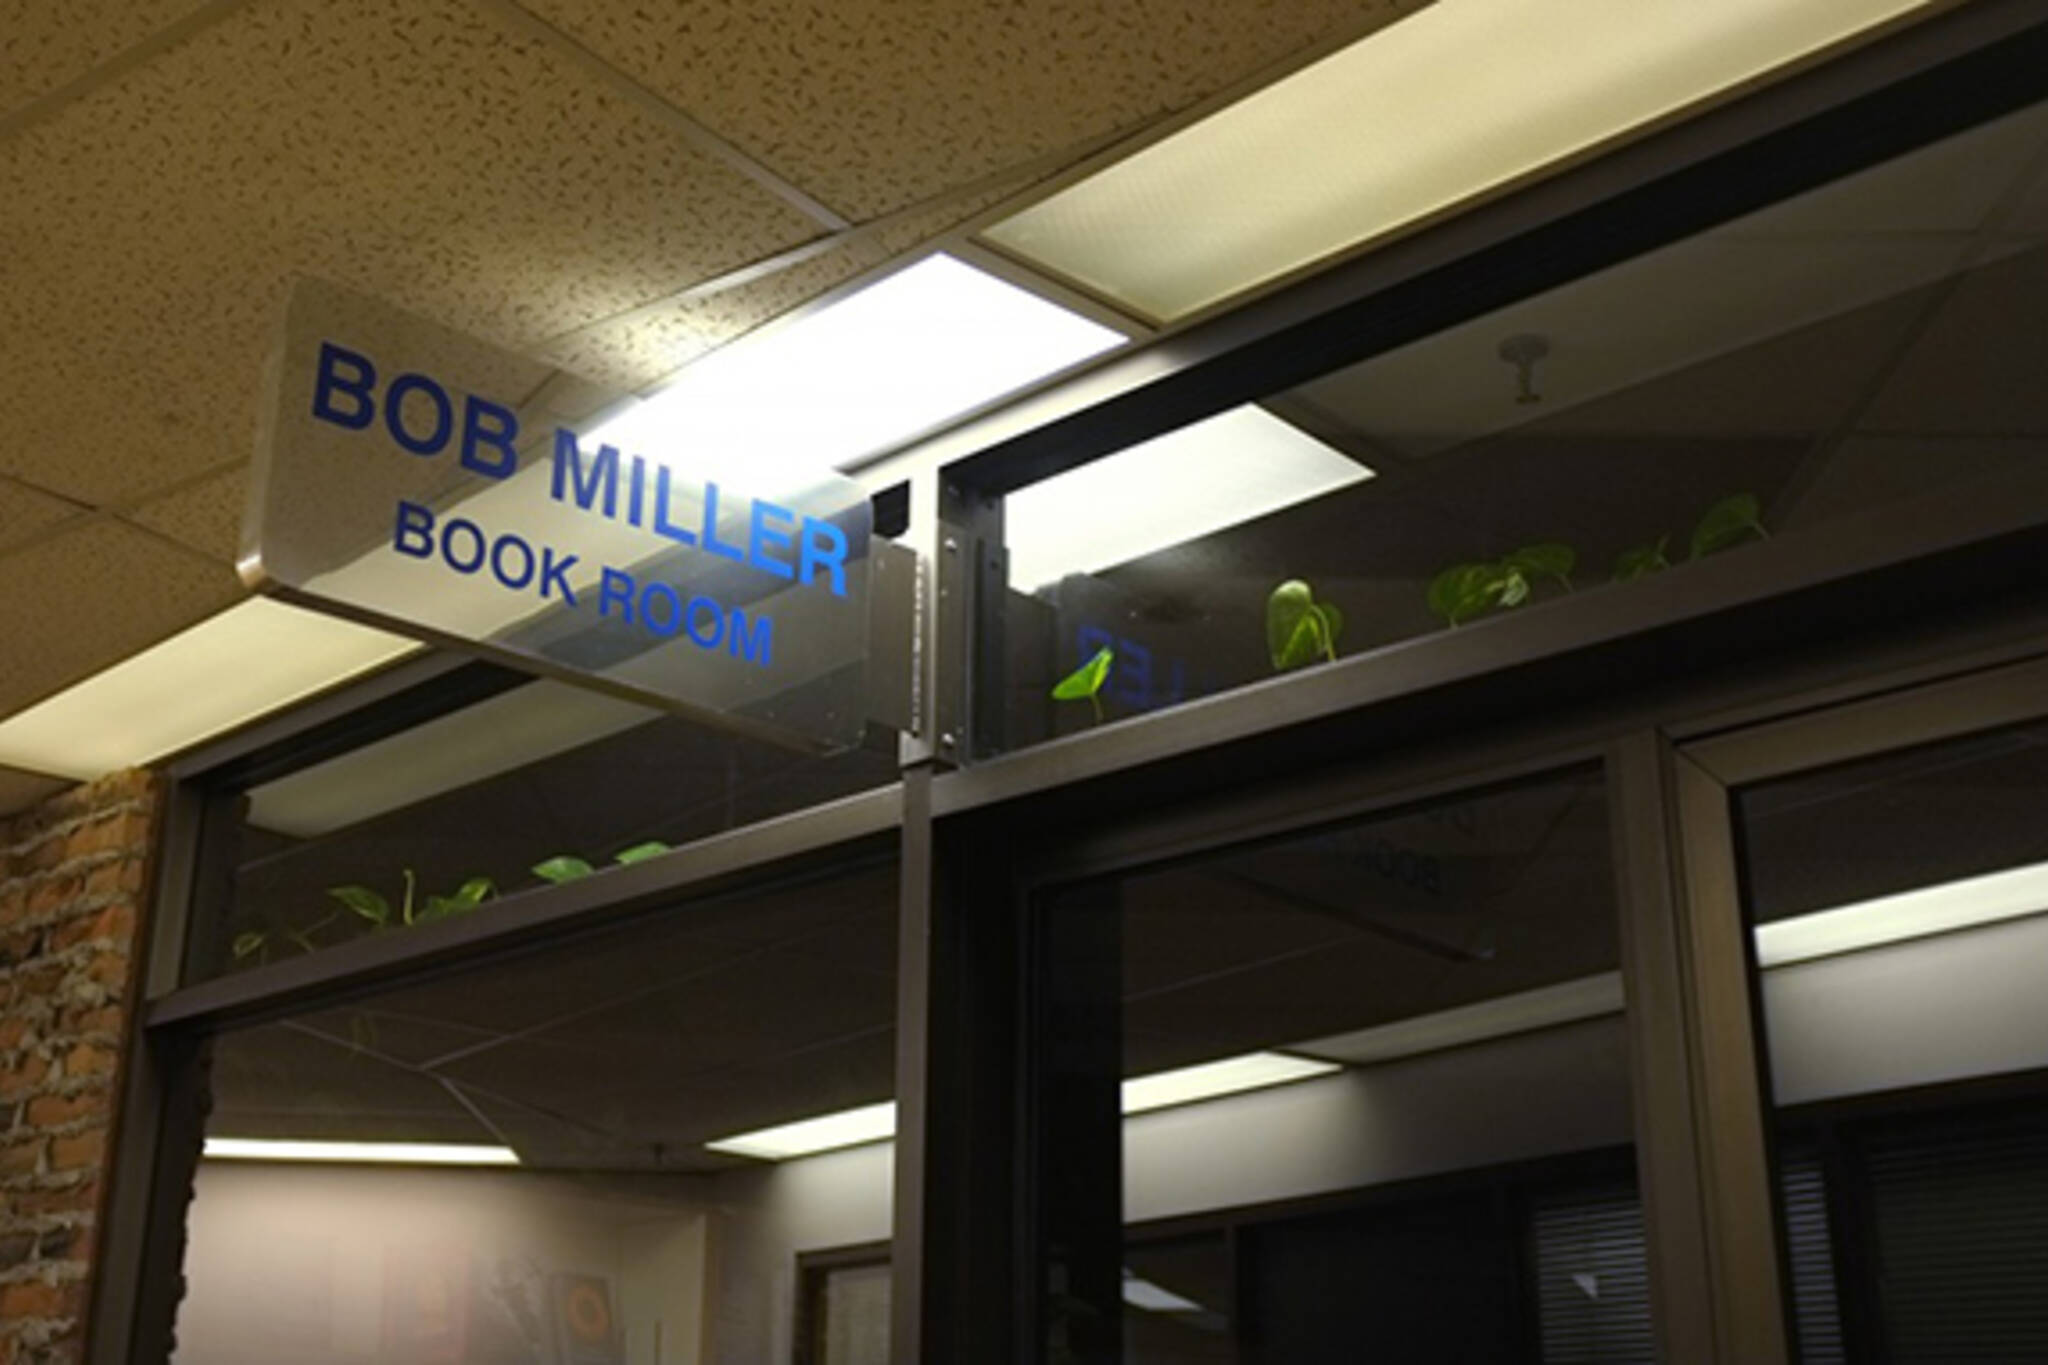 Bob Miller Book Room